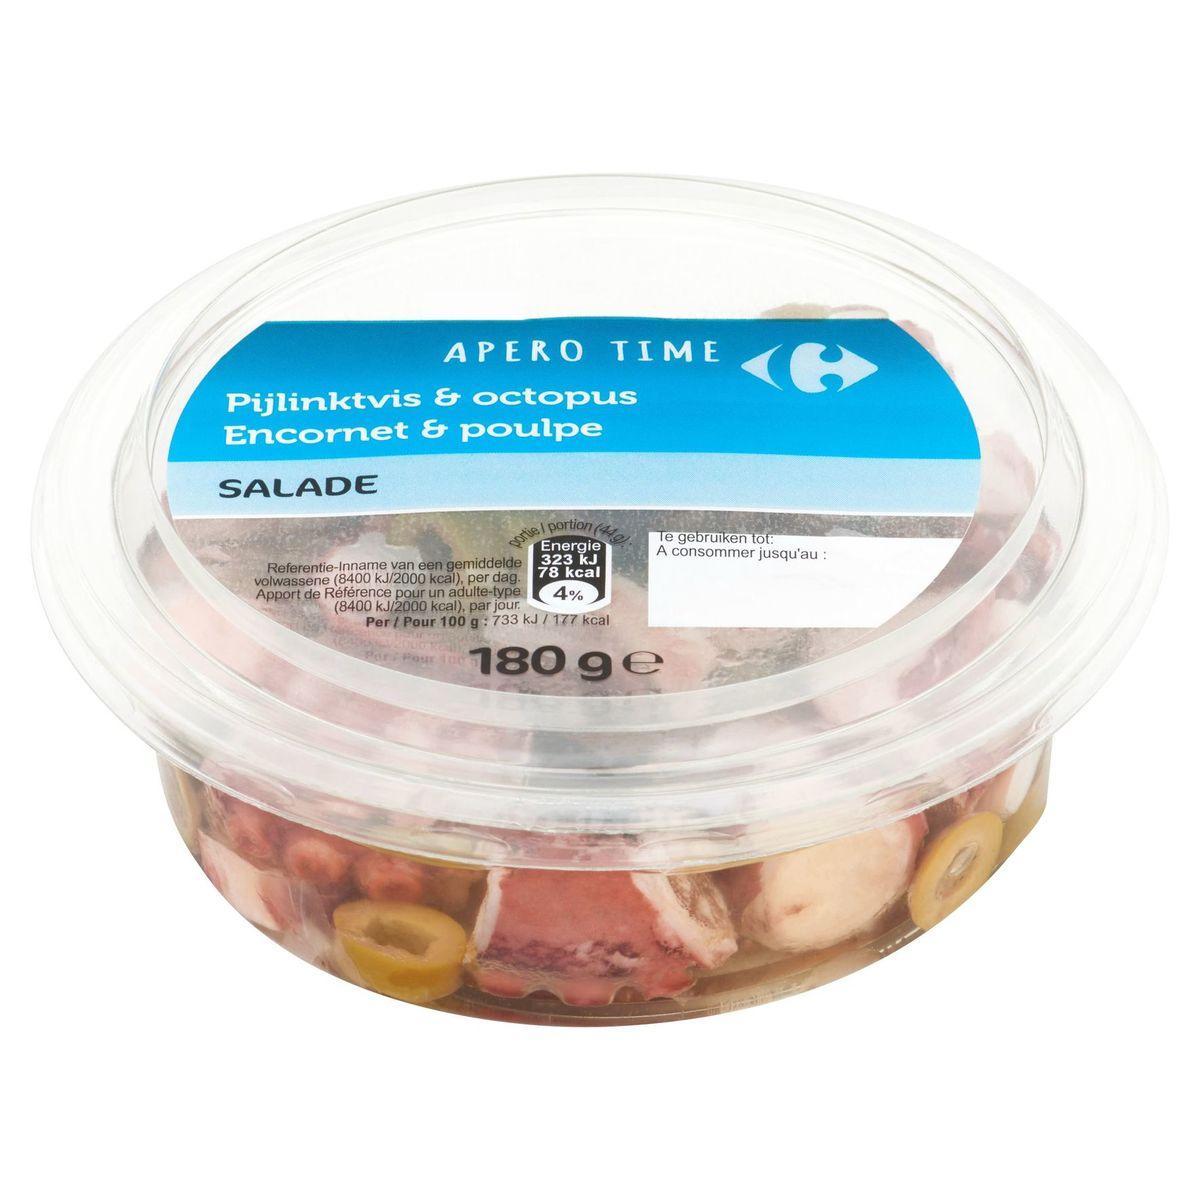 Carrefour Apero Time Encornet & Poulpe Salade 180 g